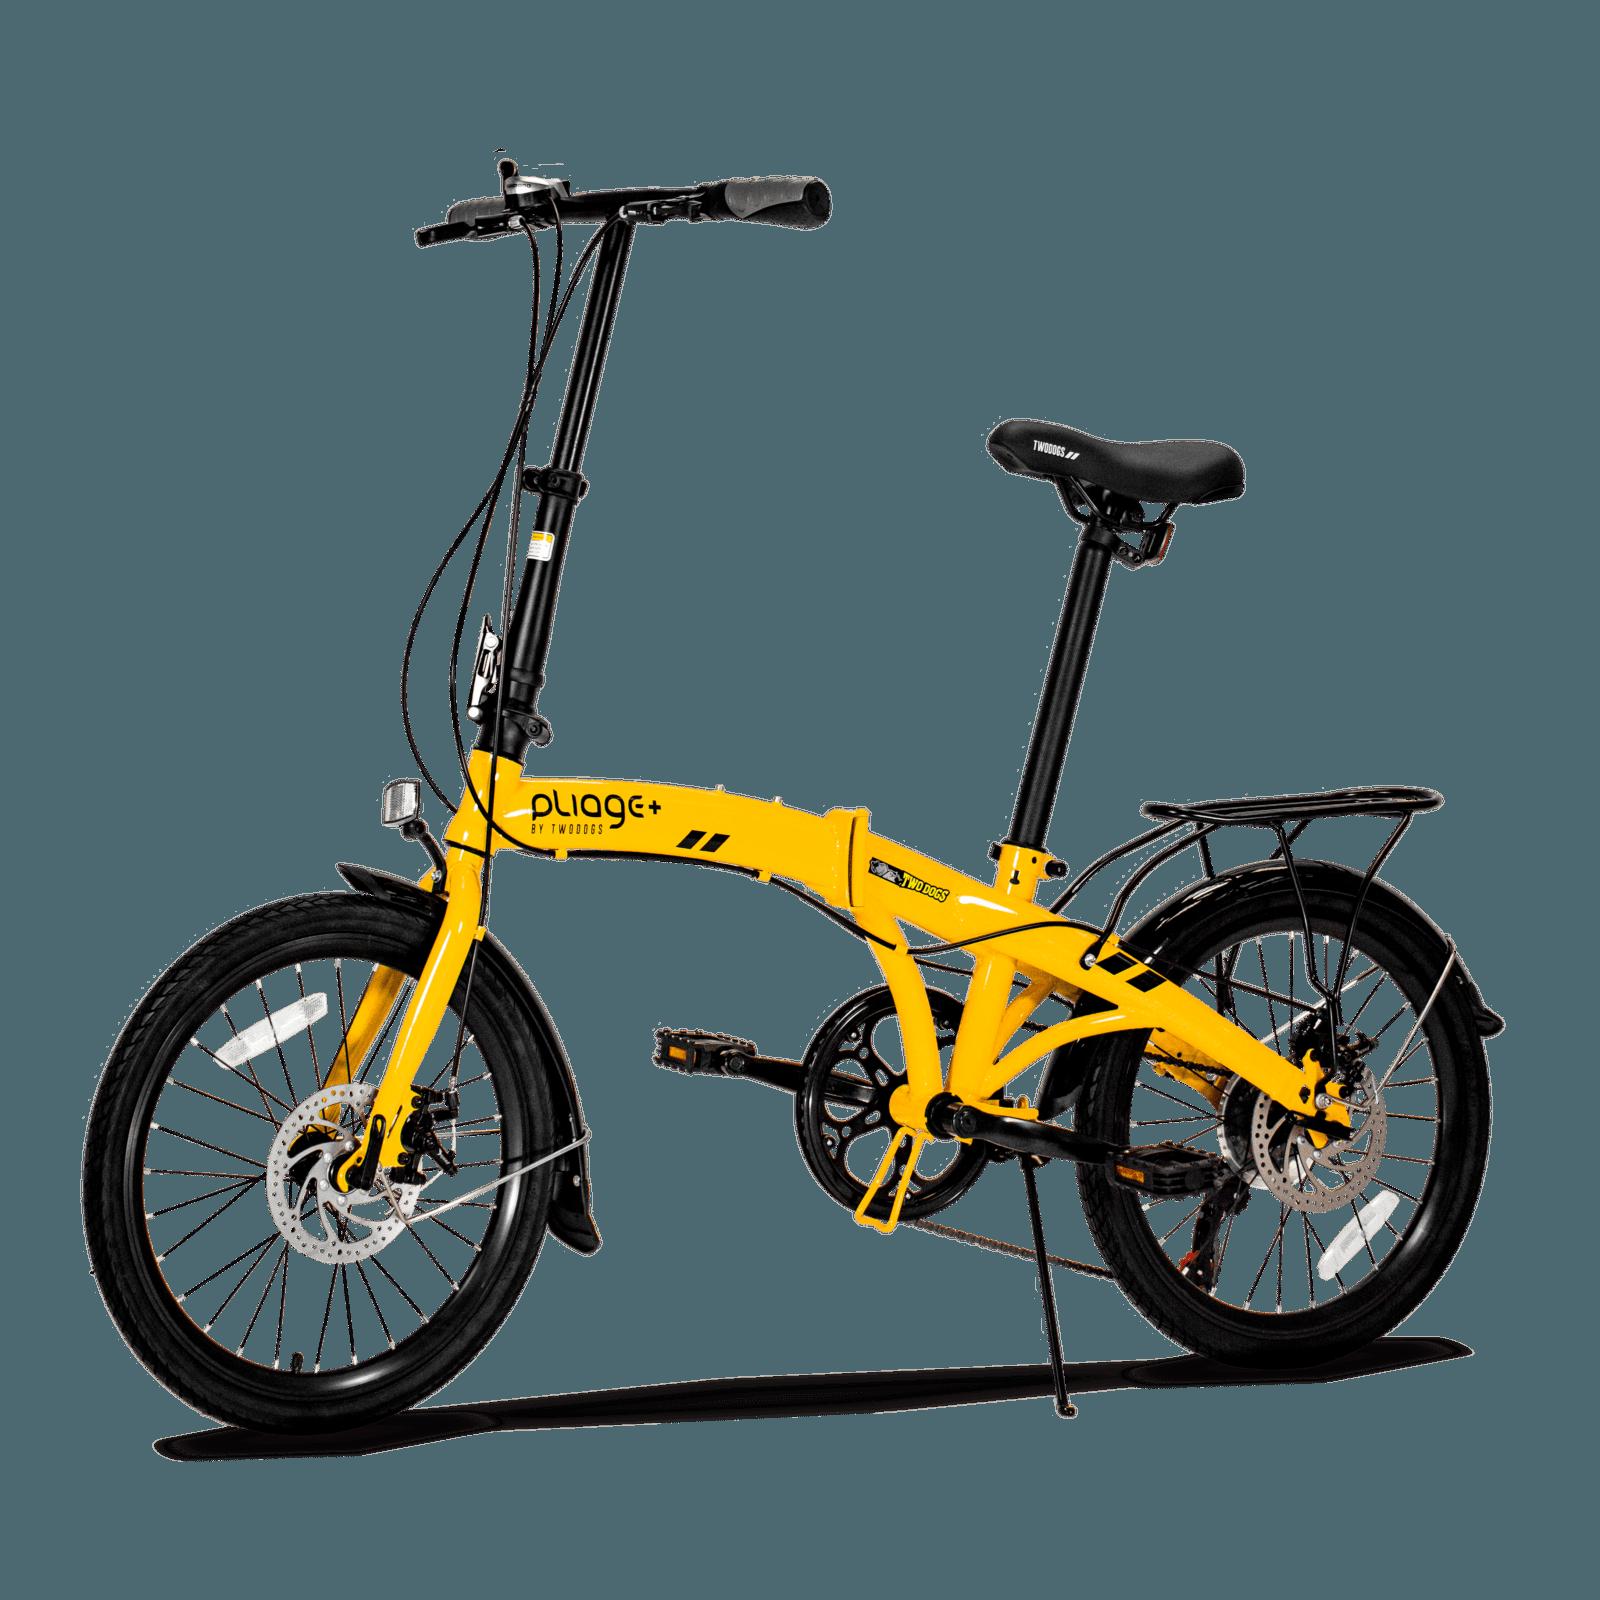 Bicicleta dobrável Pliage Plus Two Dogs cor amarela